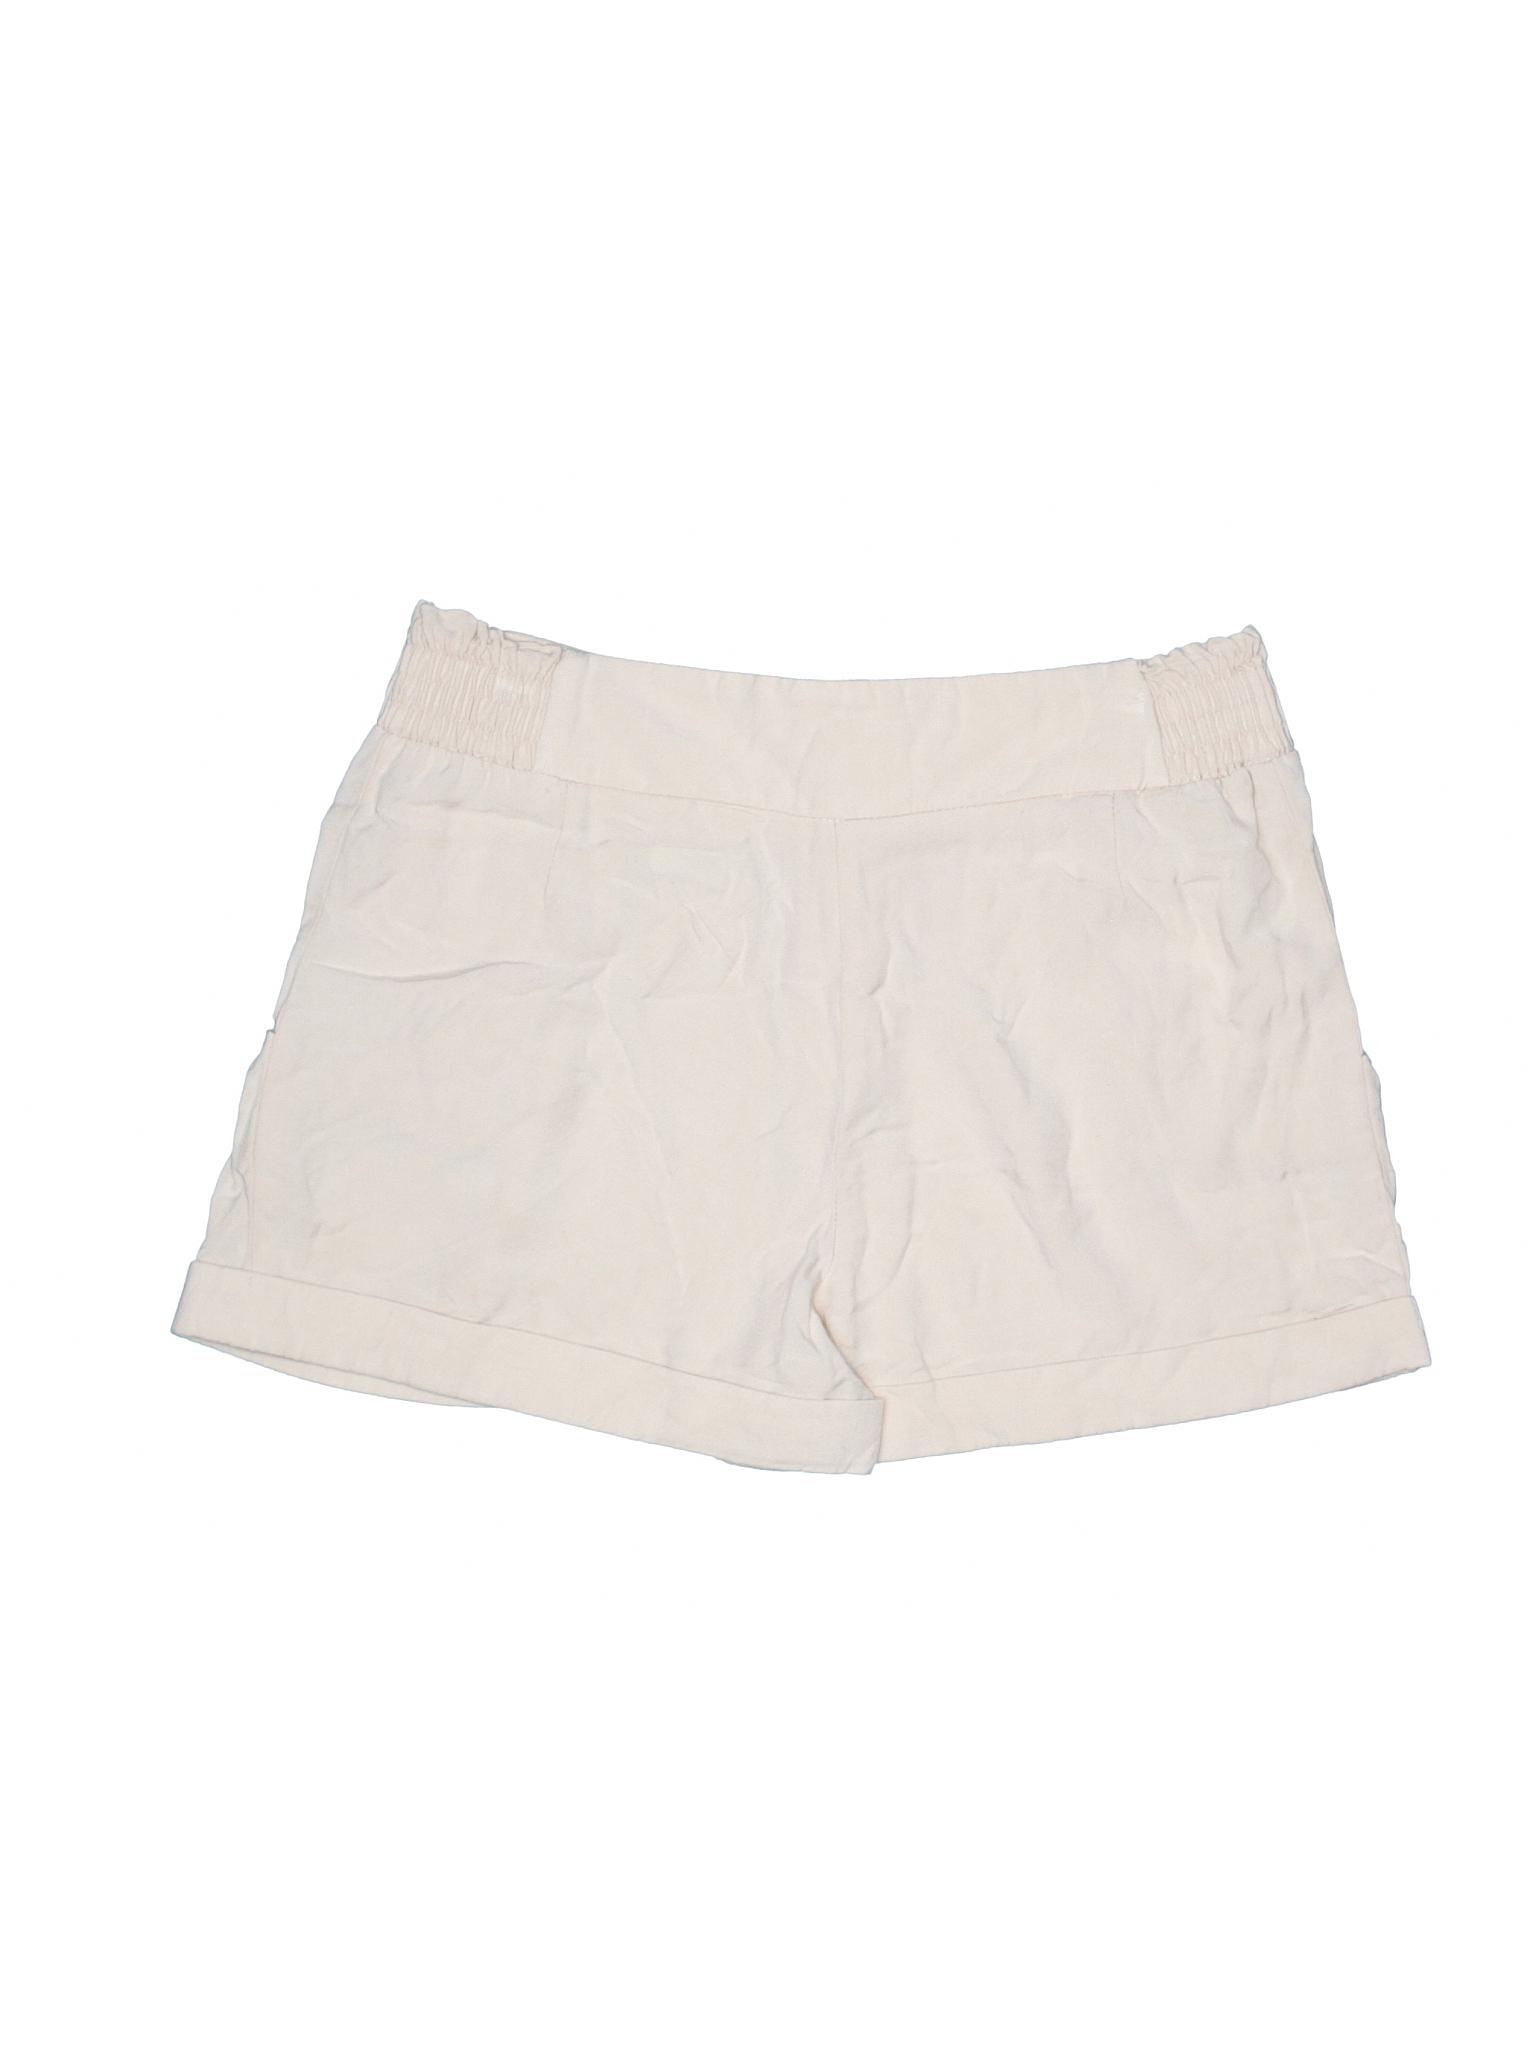 Boutique leisure Shorts Fade Sparkle amp; xHwqZB7